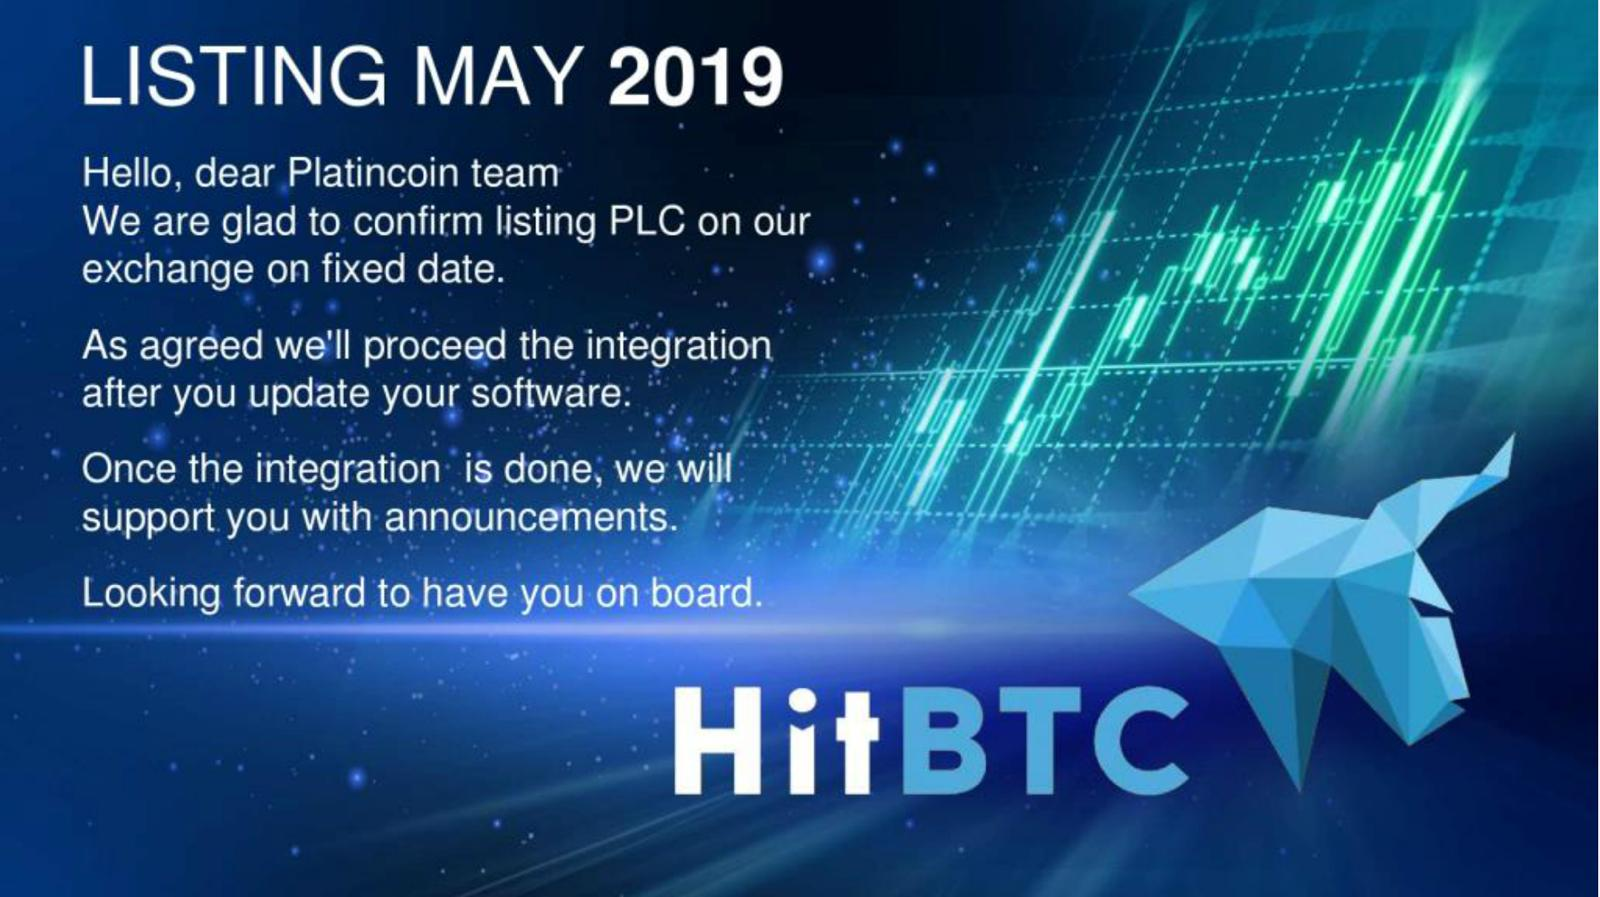 hitbtc platincoinsite.blog